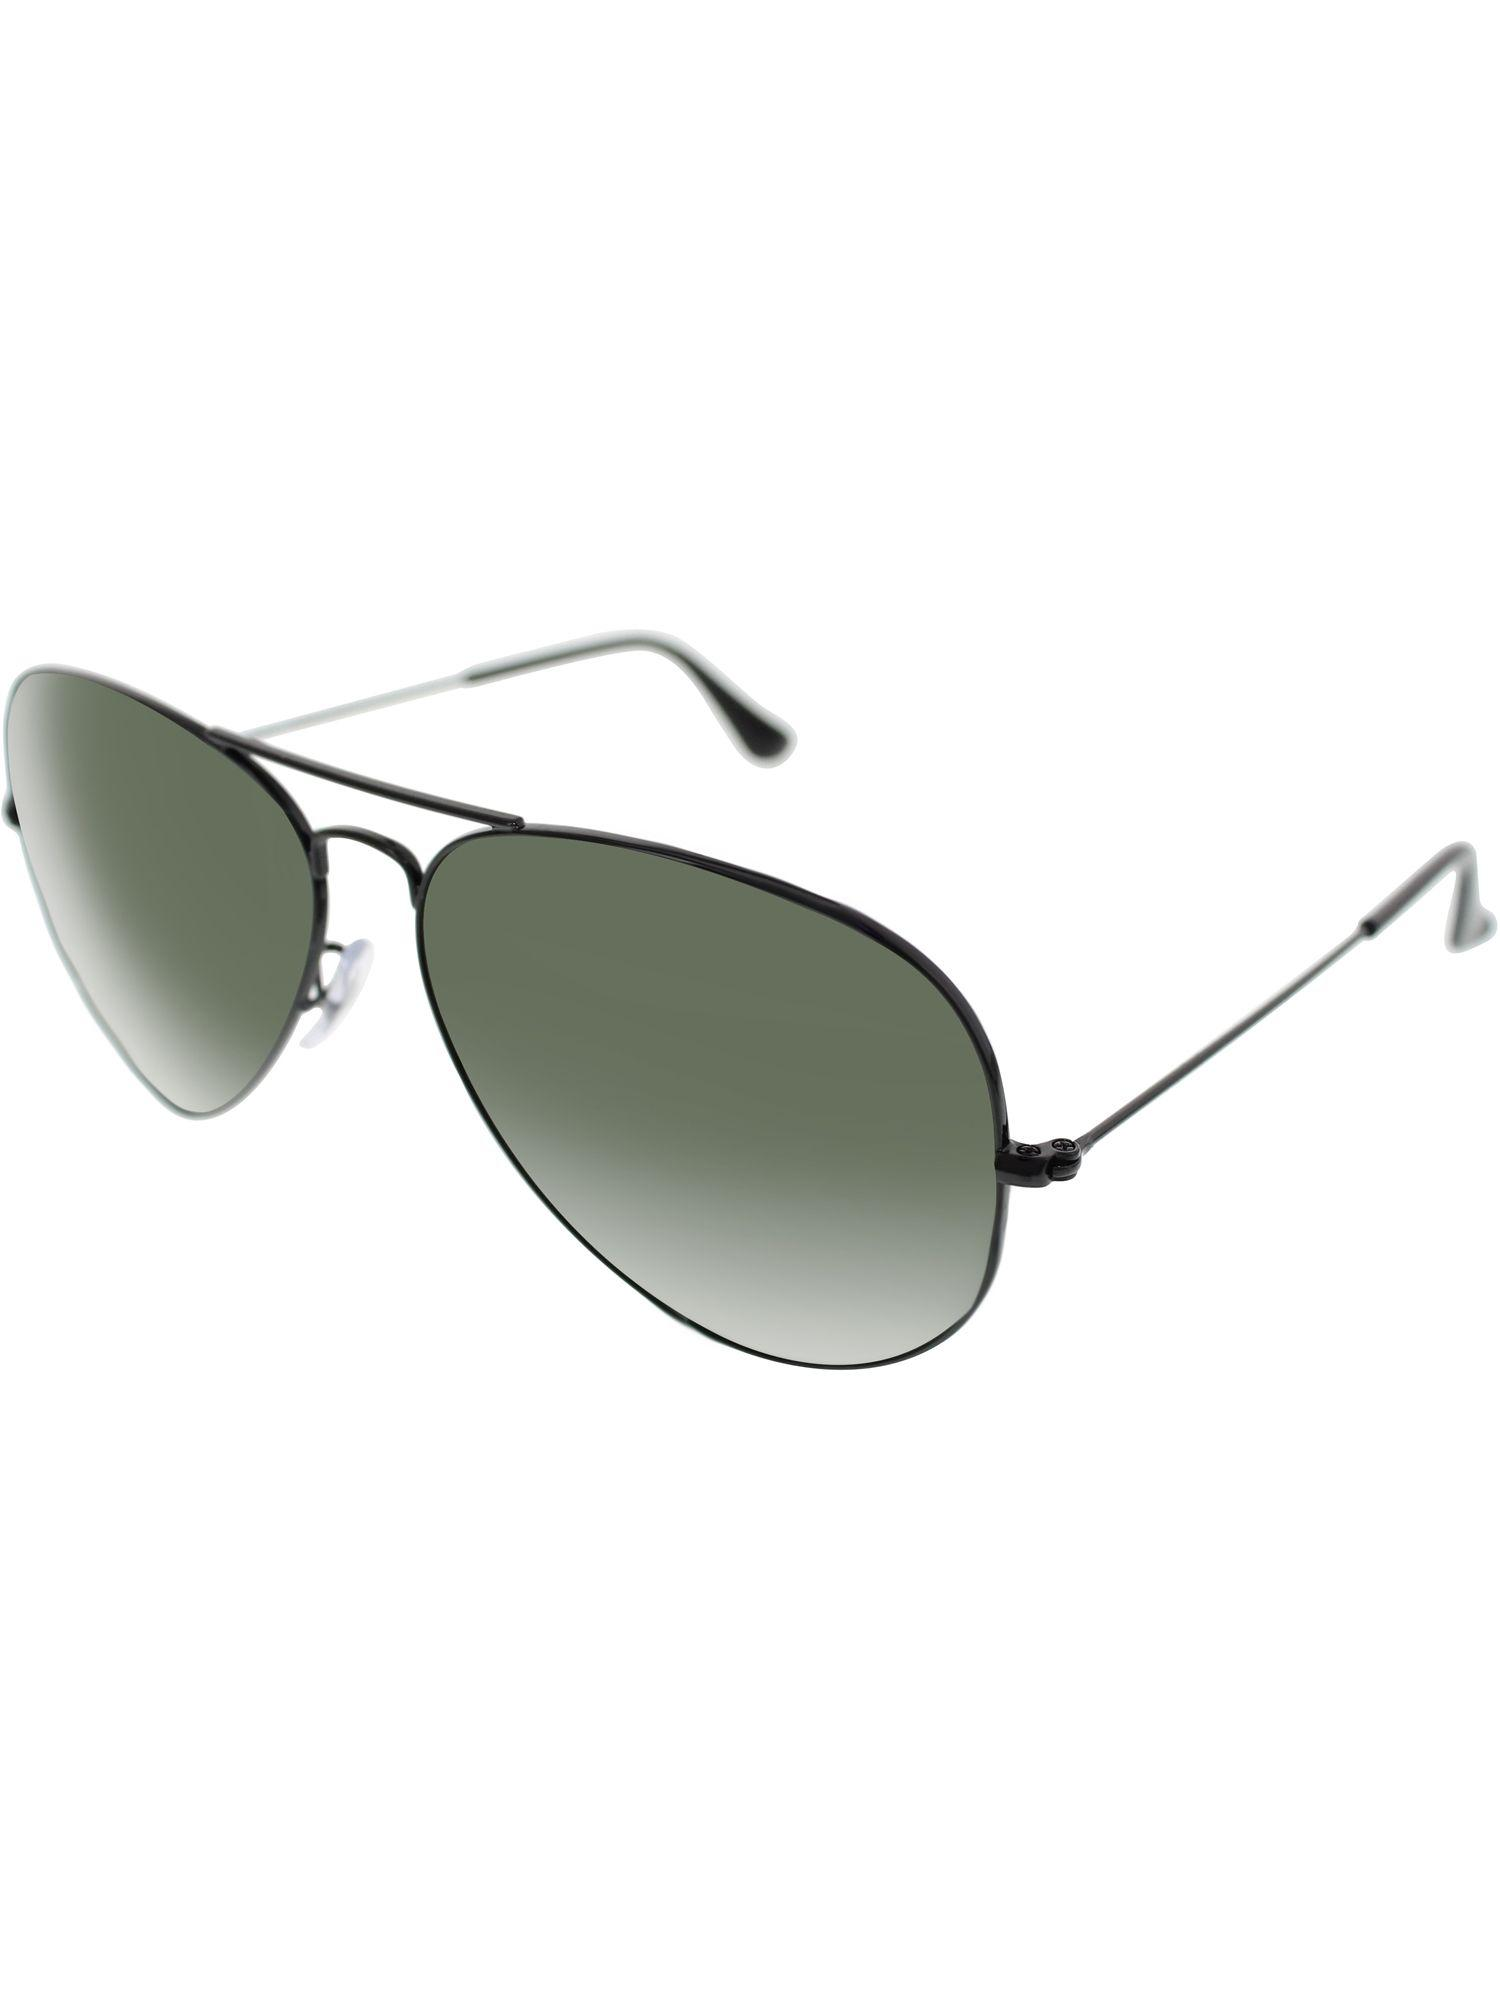 669bb4d89b5 Lyst - Ray-Ban Men s Aviator Rb3026-l2821-62 Black Sunglasses for Men